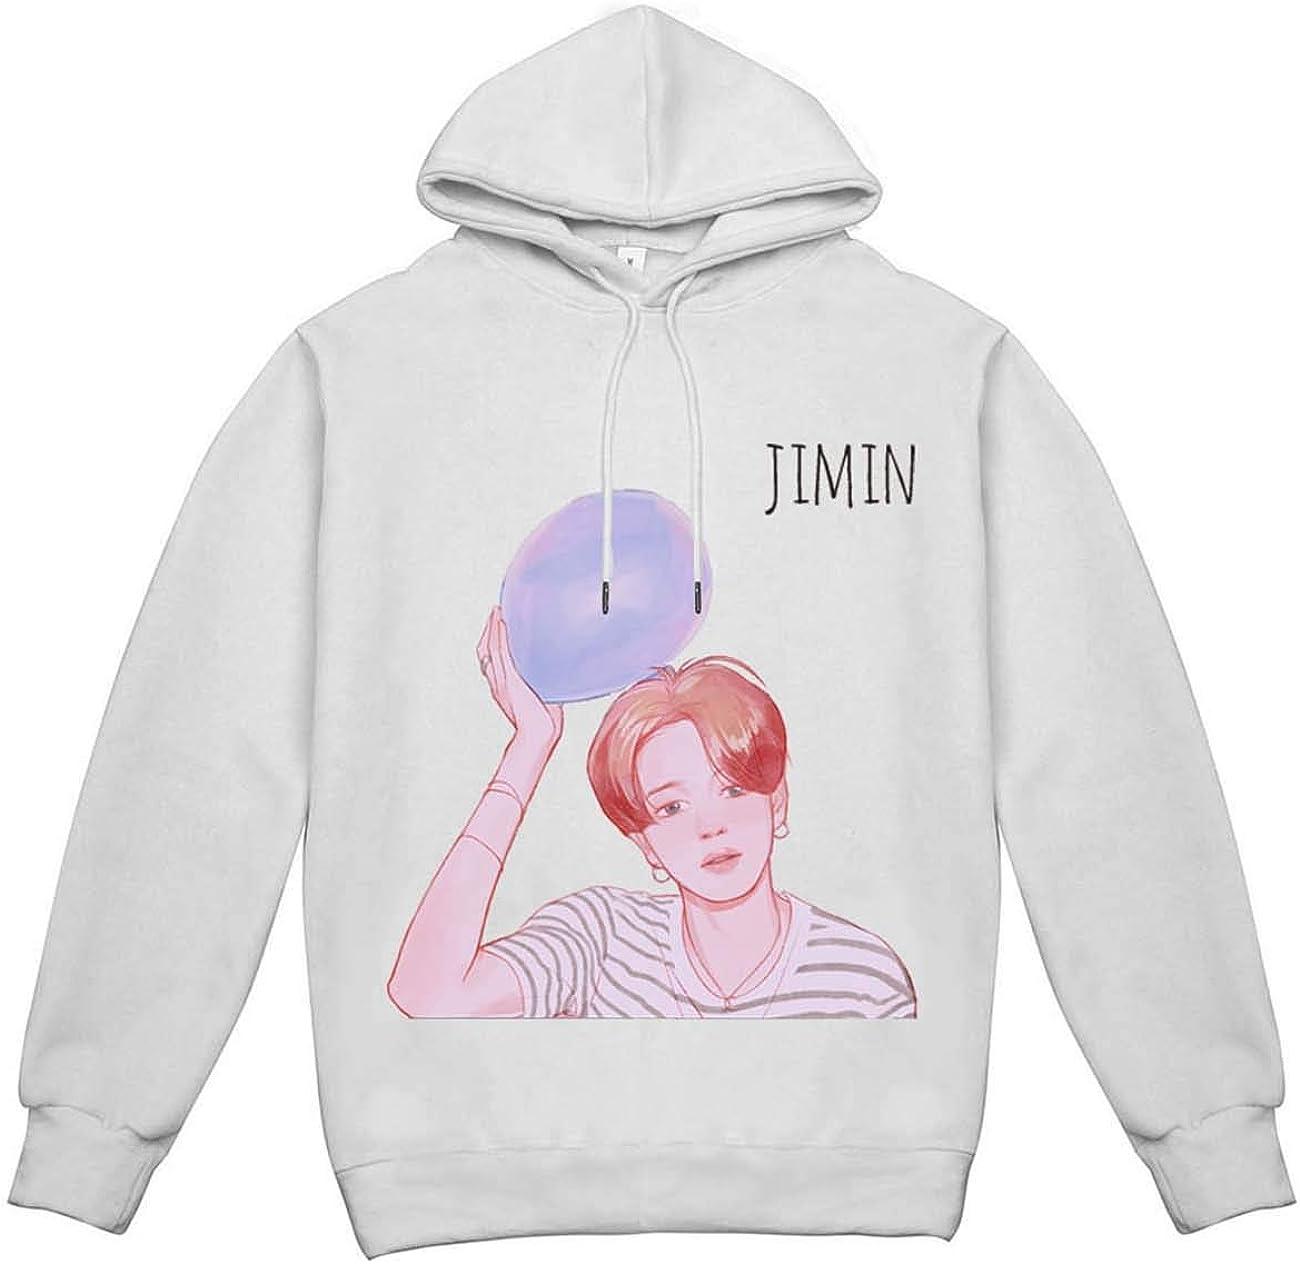 ZIGJOY BTS Hoodie Cartoon Portrait Hooded Sweatshirt Long Sleeve Unisex Pullover Jungkook Jimin JIin Suga V for Fans